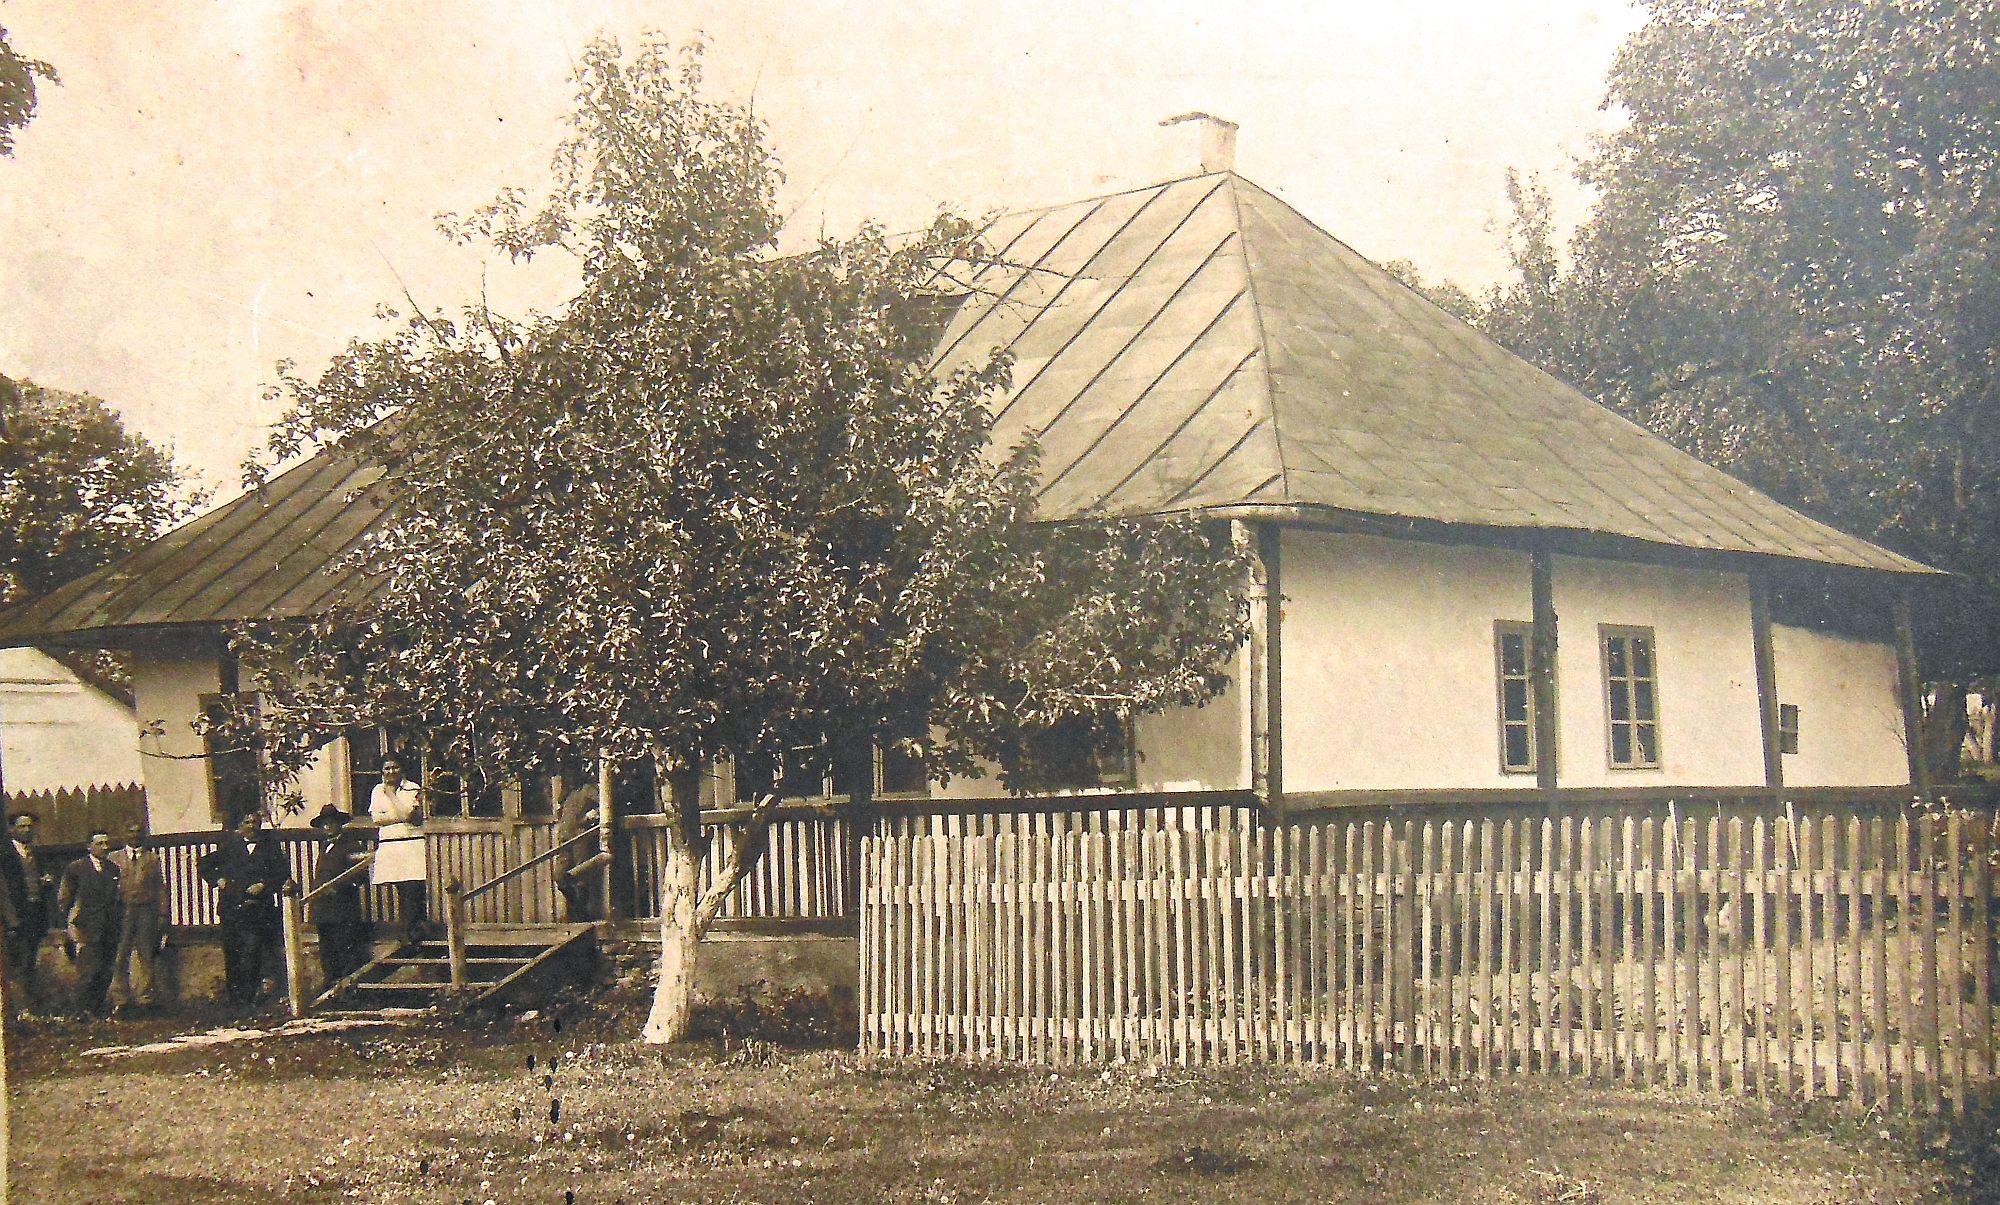 02_B_B0_CASA Enescu Mihaileni in 1923 Kopie